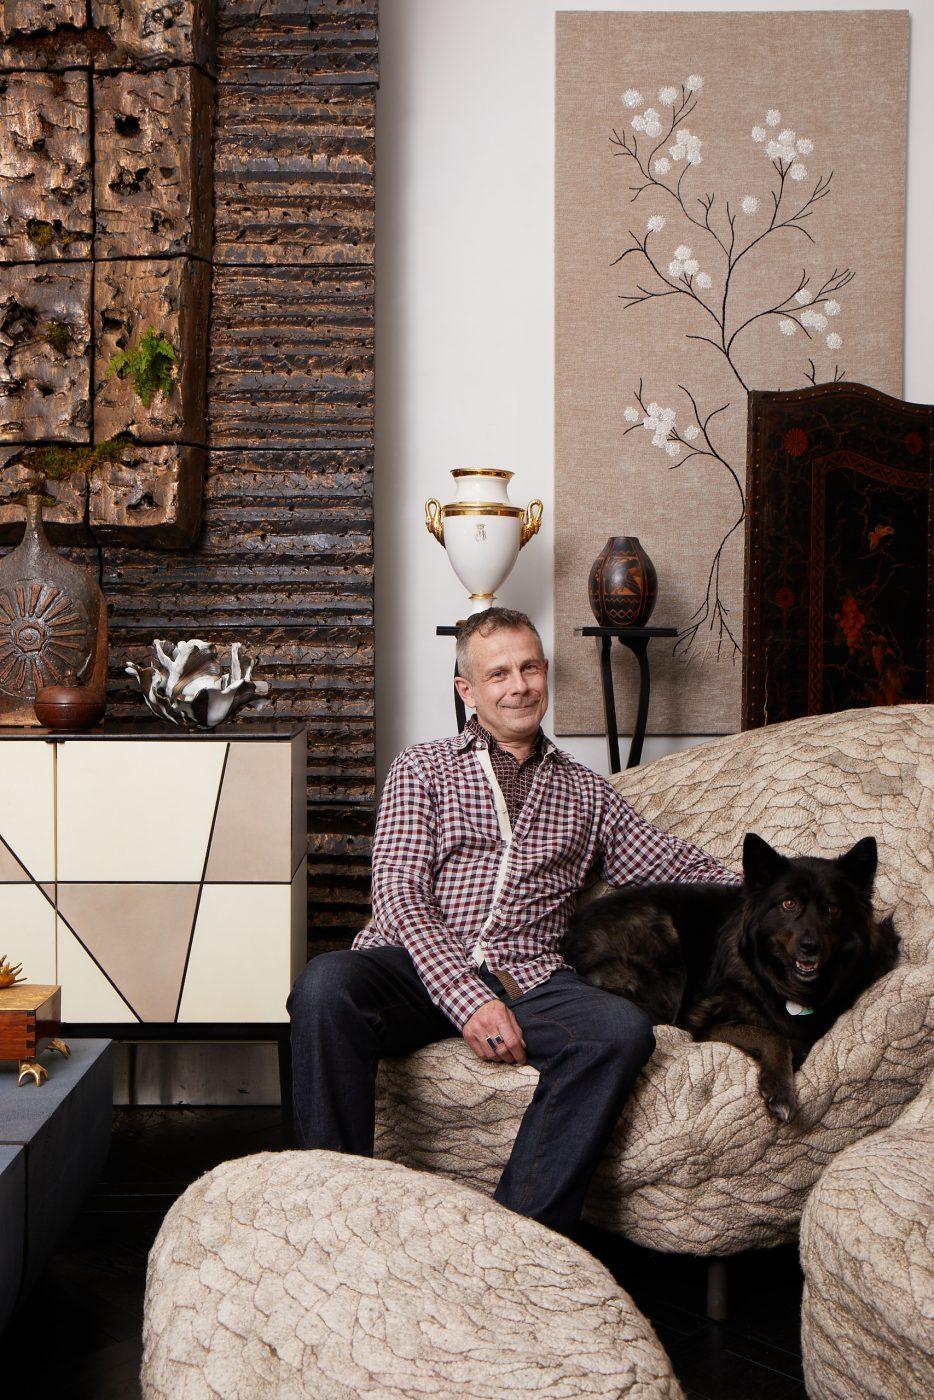 Portrait of Benoist Drut with his dog